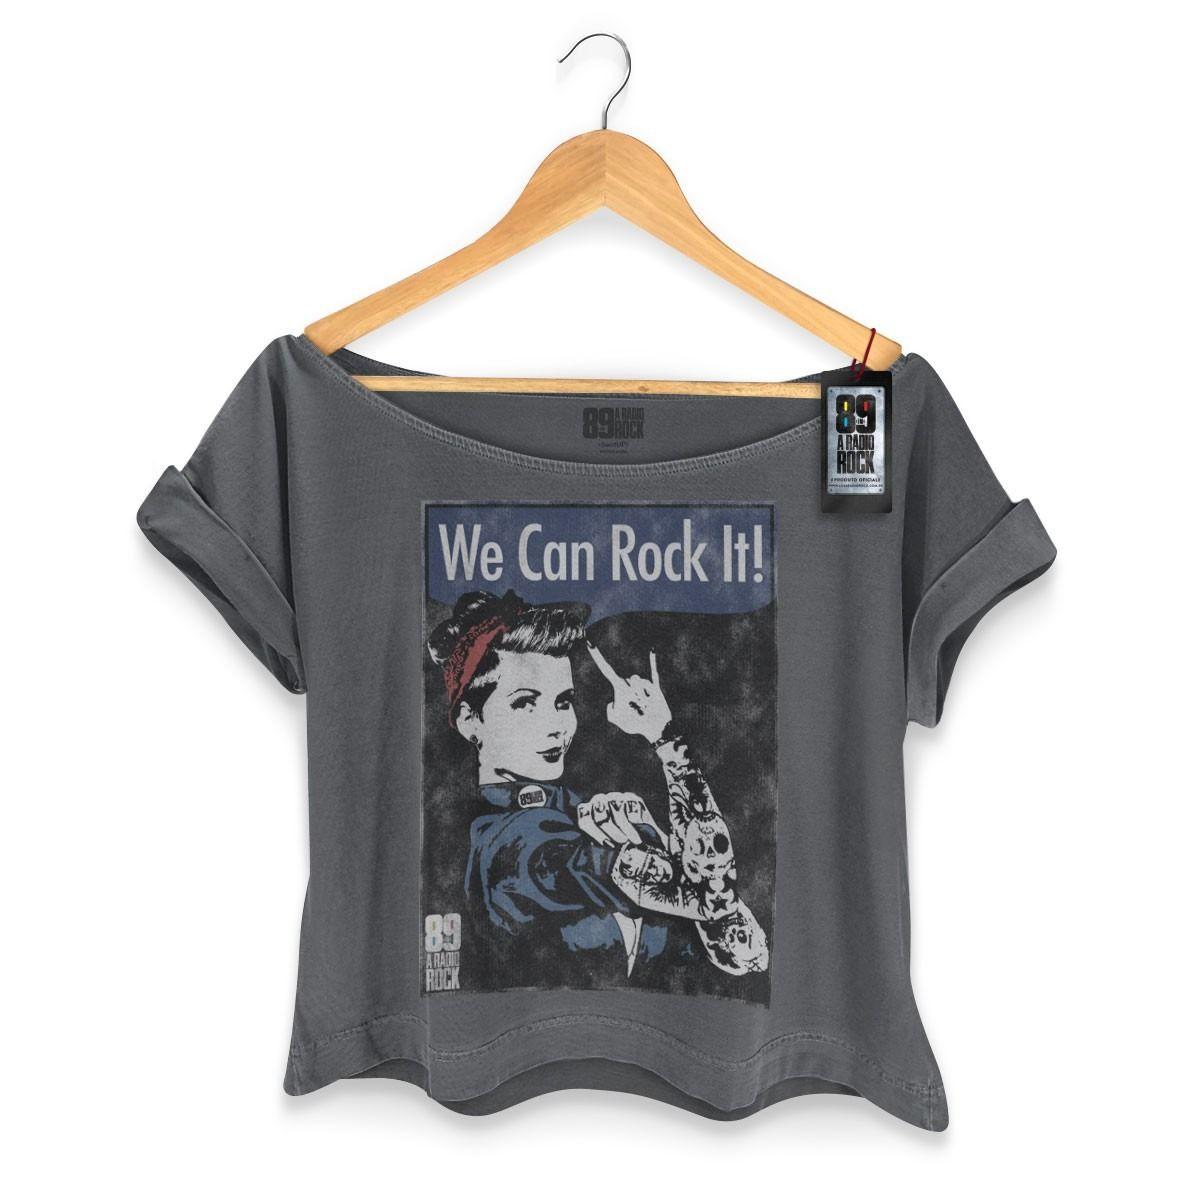 1af2ad3043 T-shirt Premium Feminina 89fm We Can Rock It! - R  79